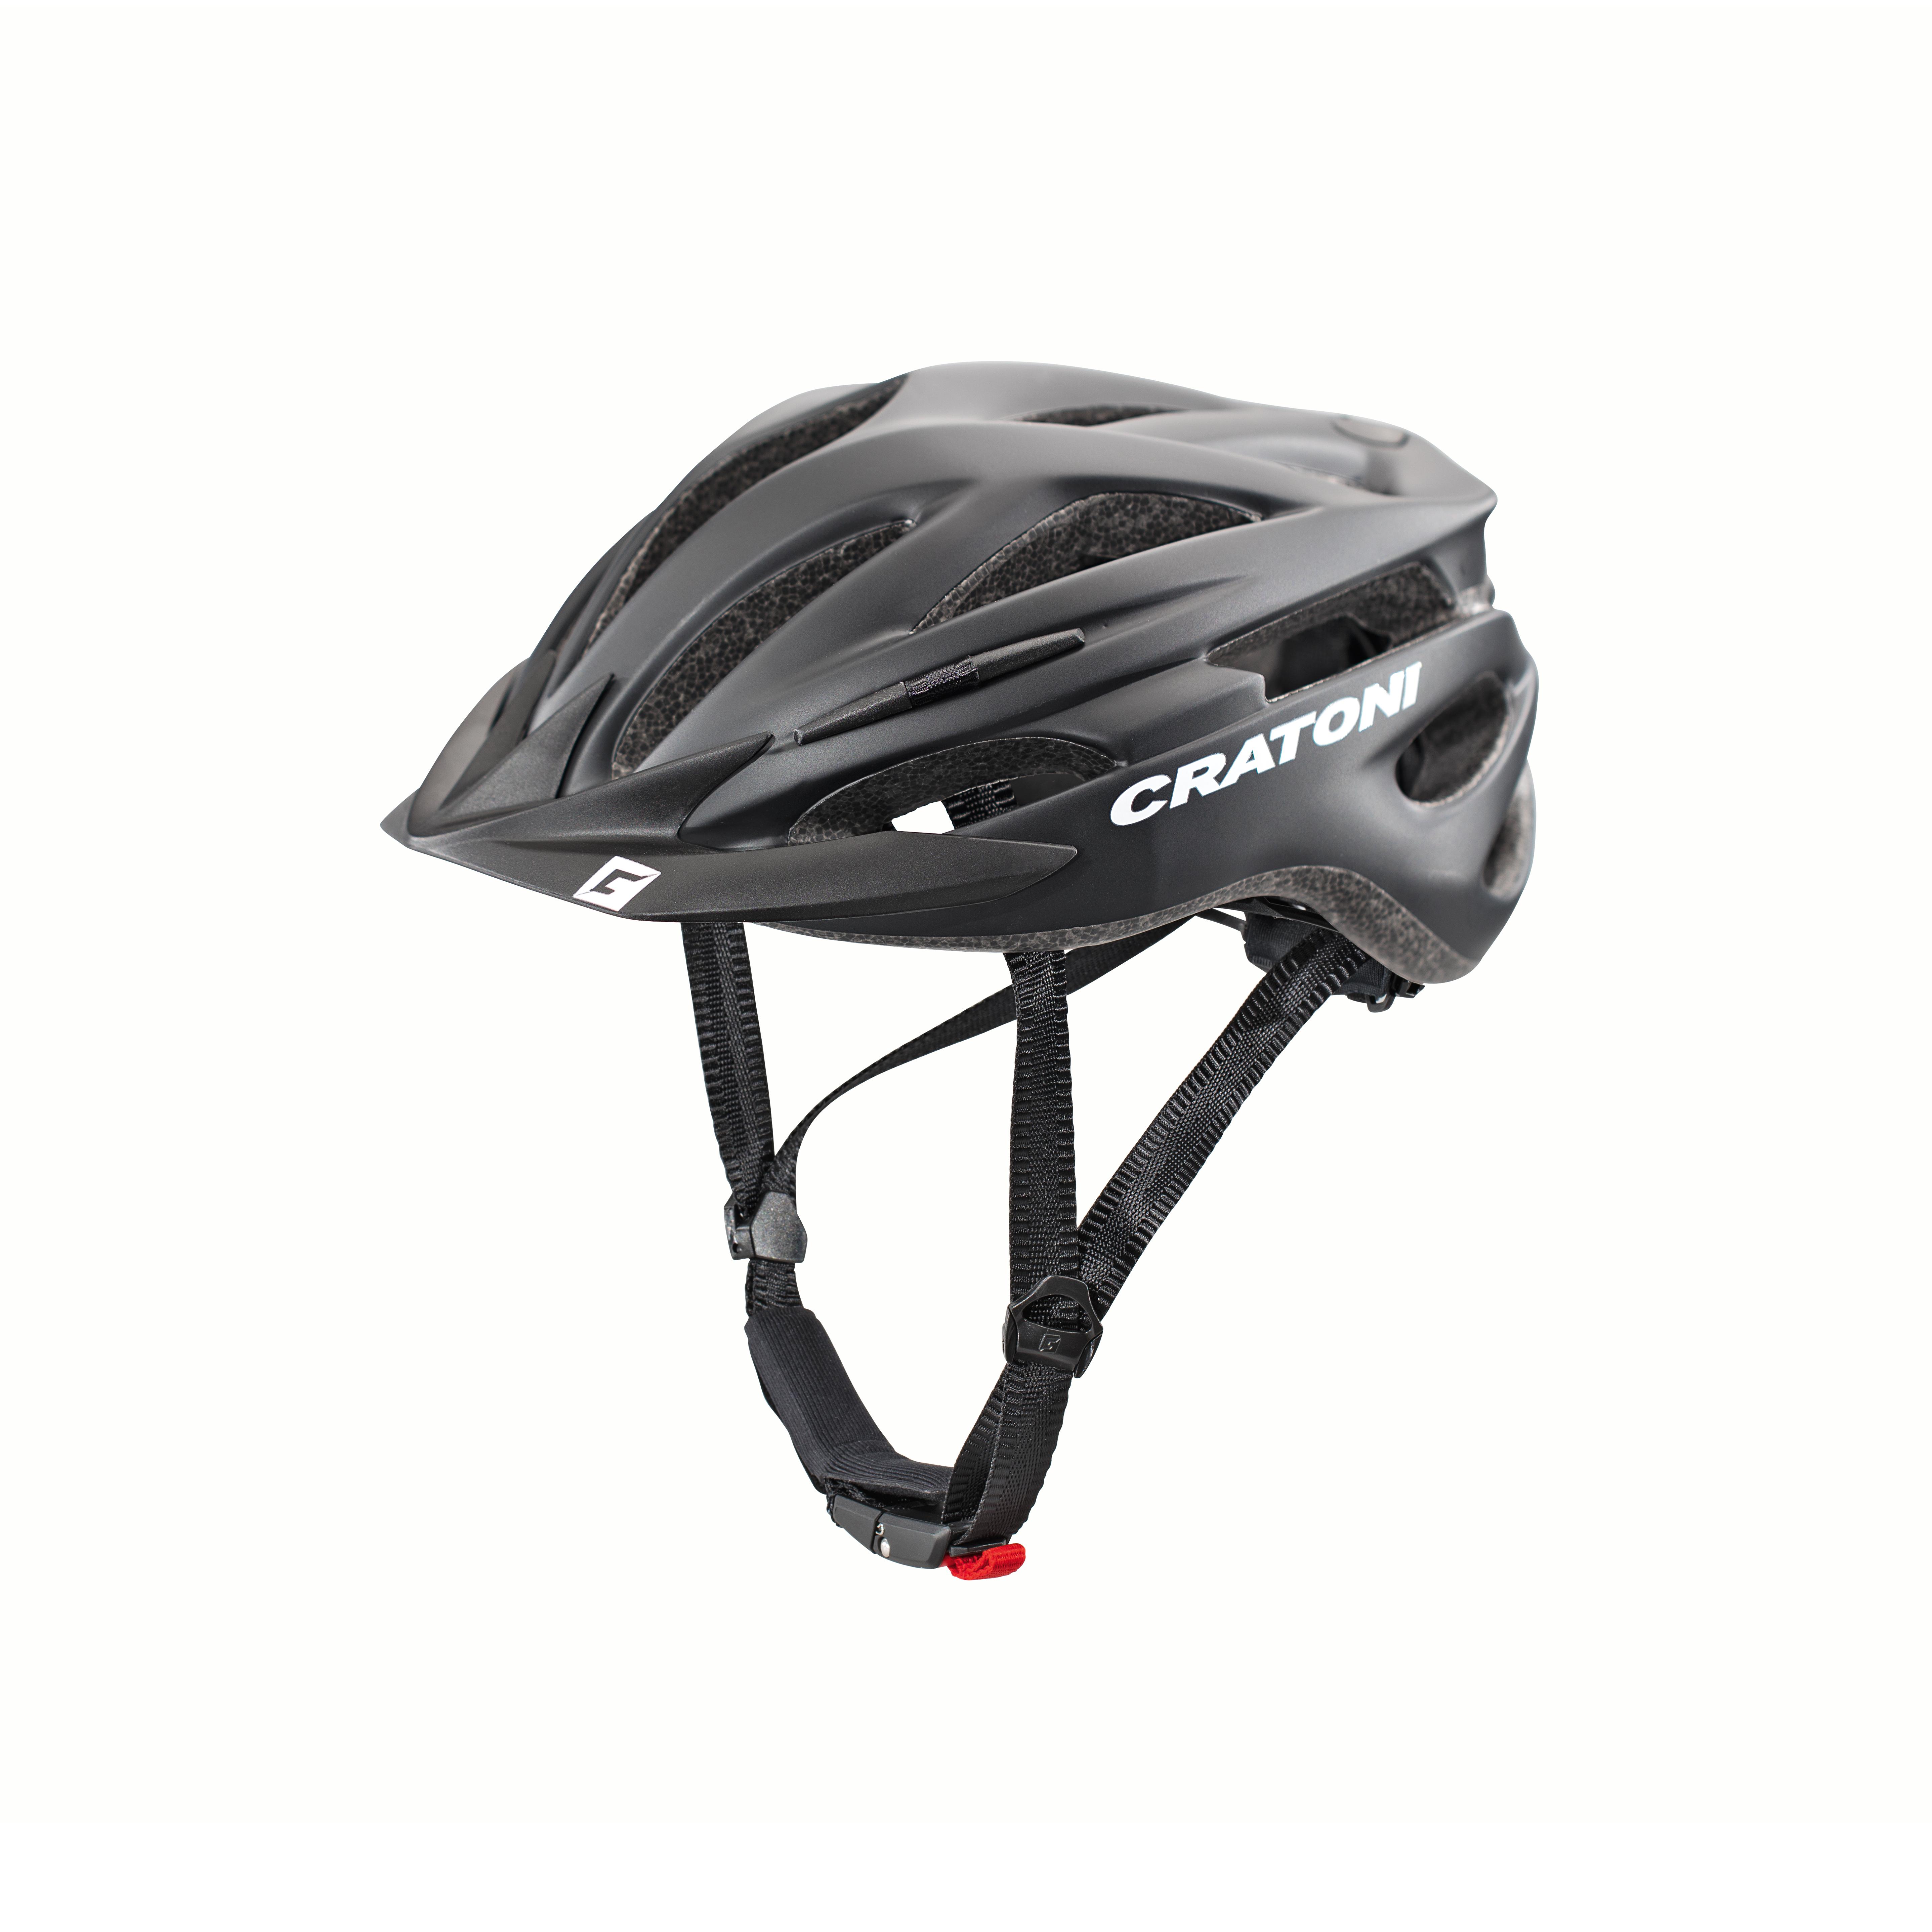 Fahrradhelm Cratoni Pacer schwarz matt